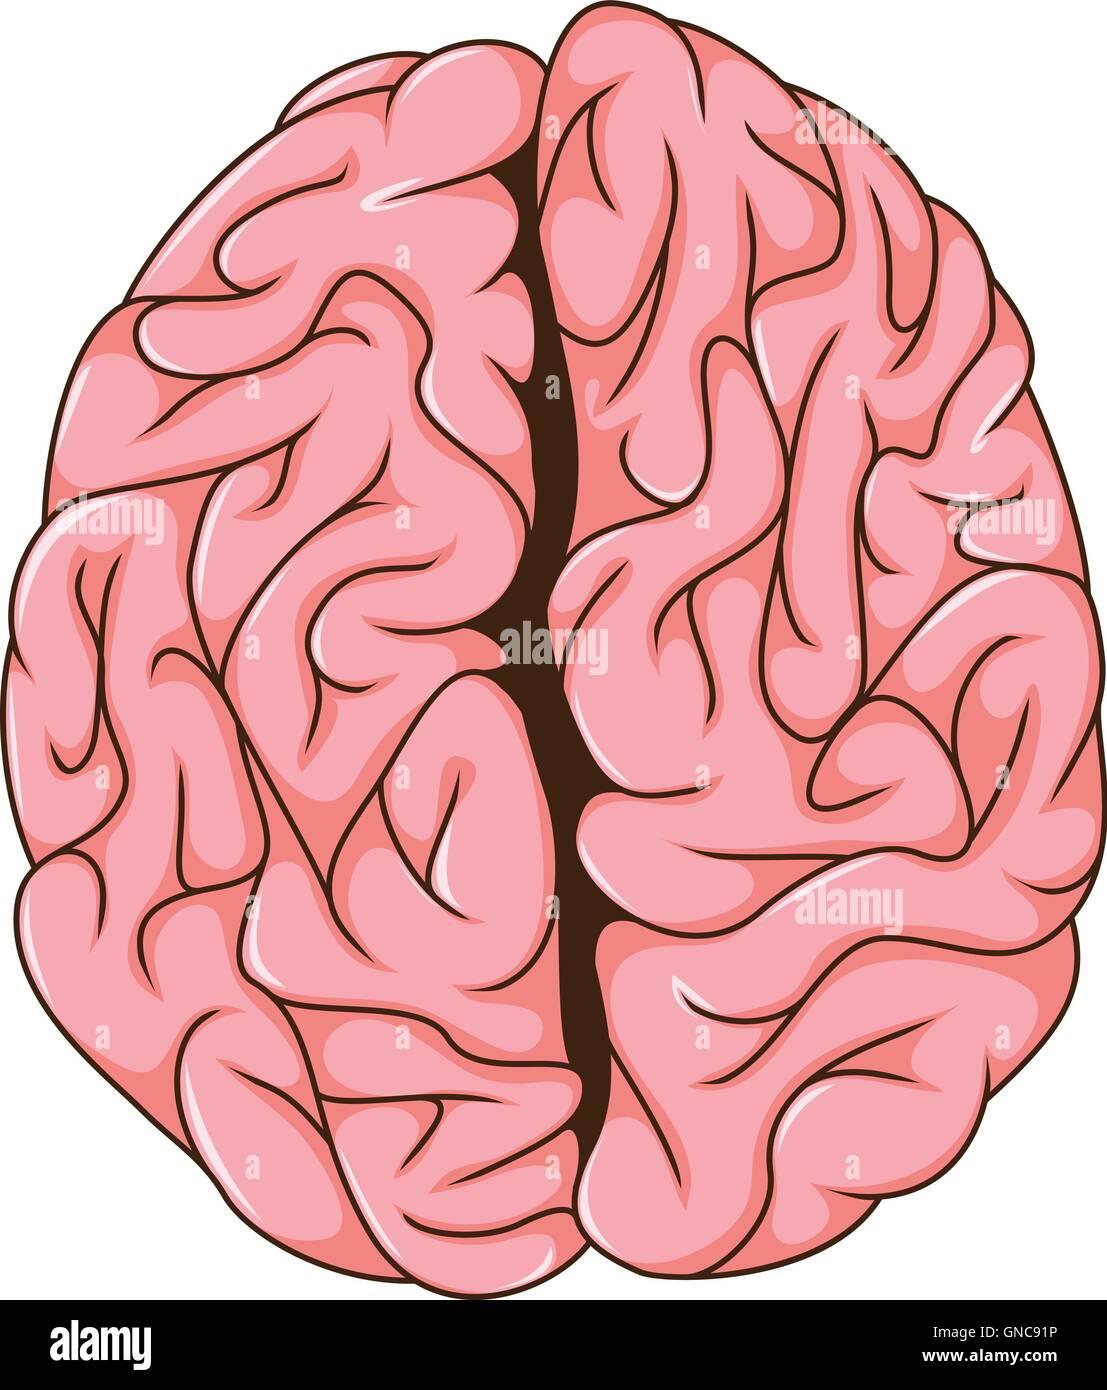 human left and right brain cartoon - Stock Image